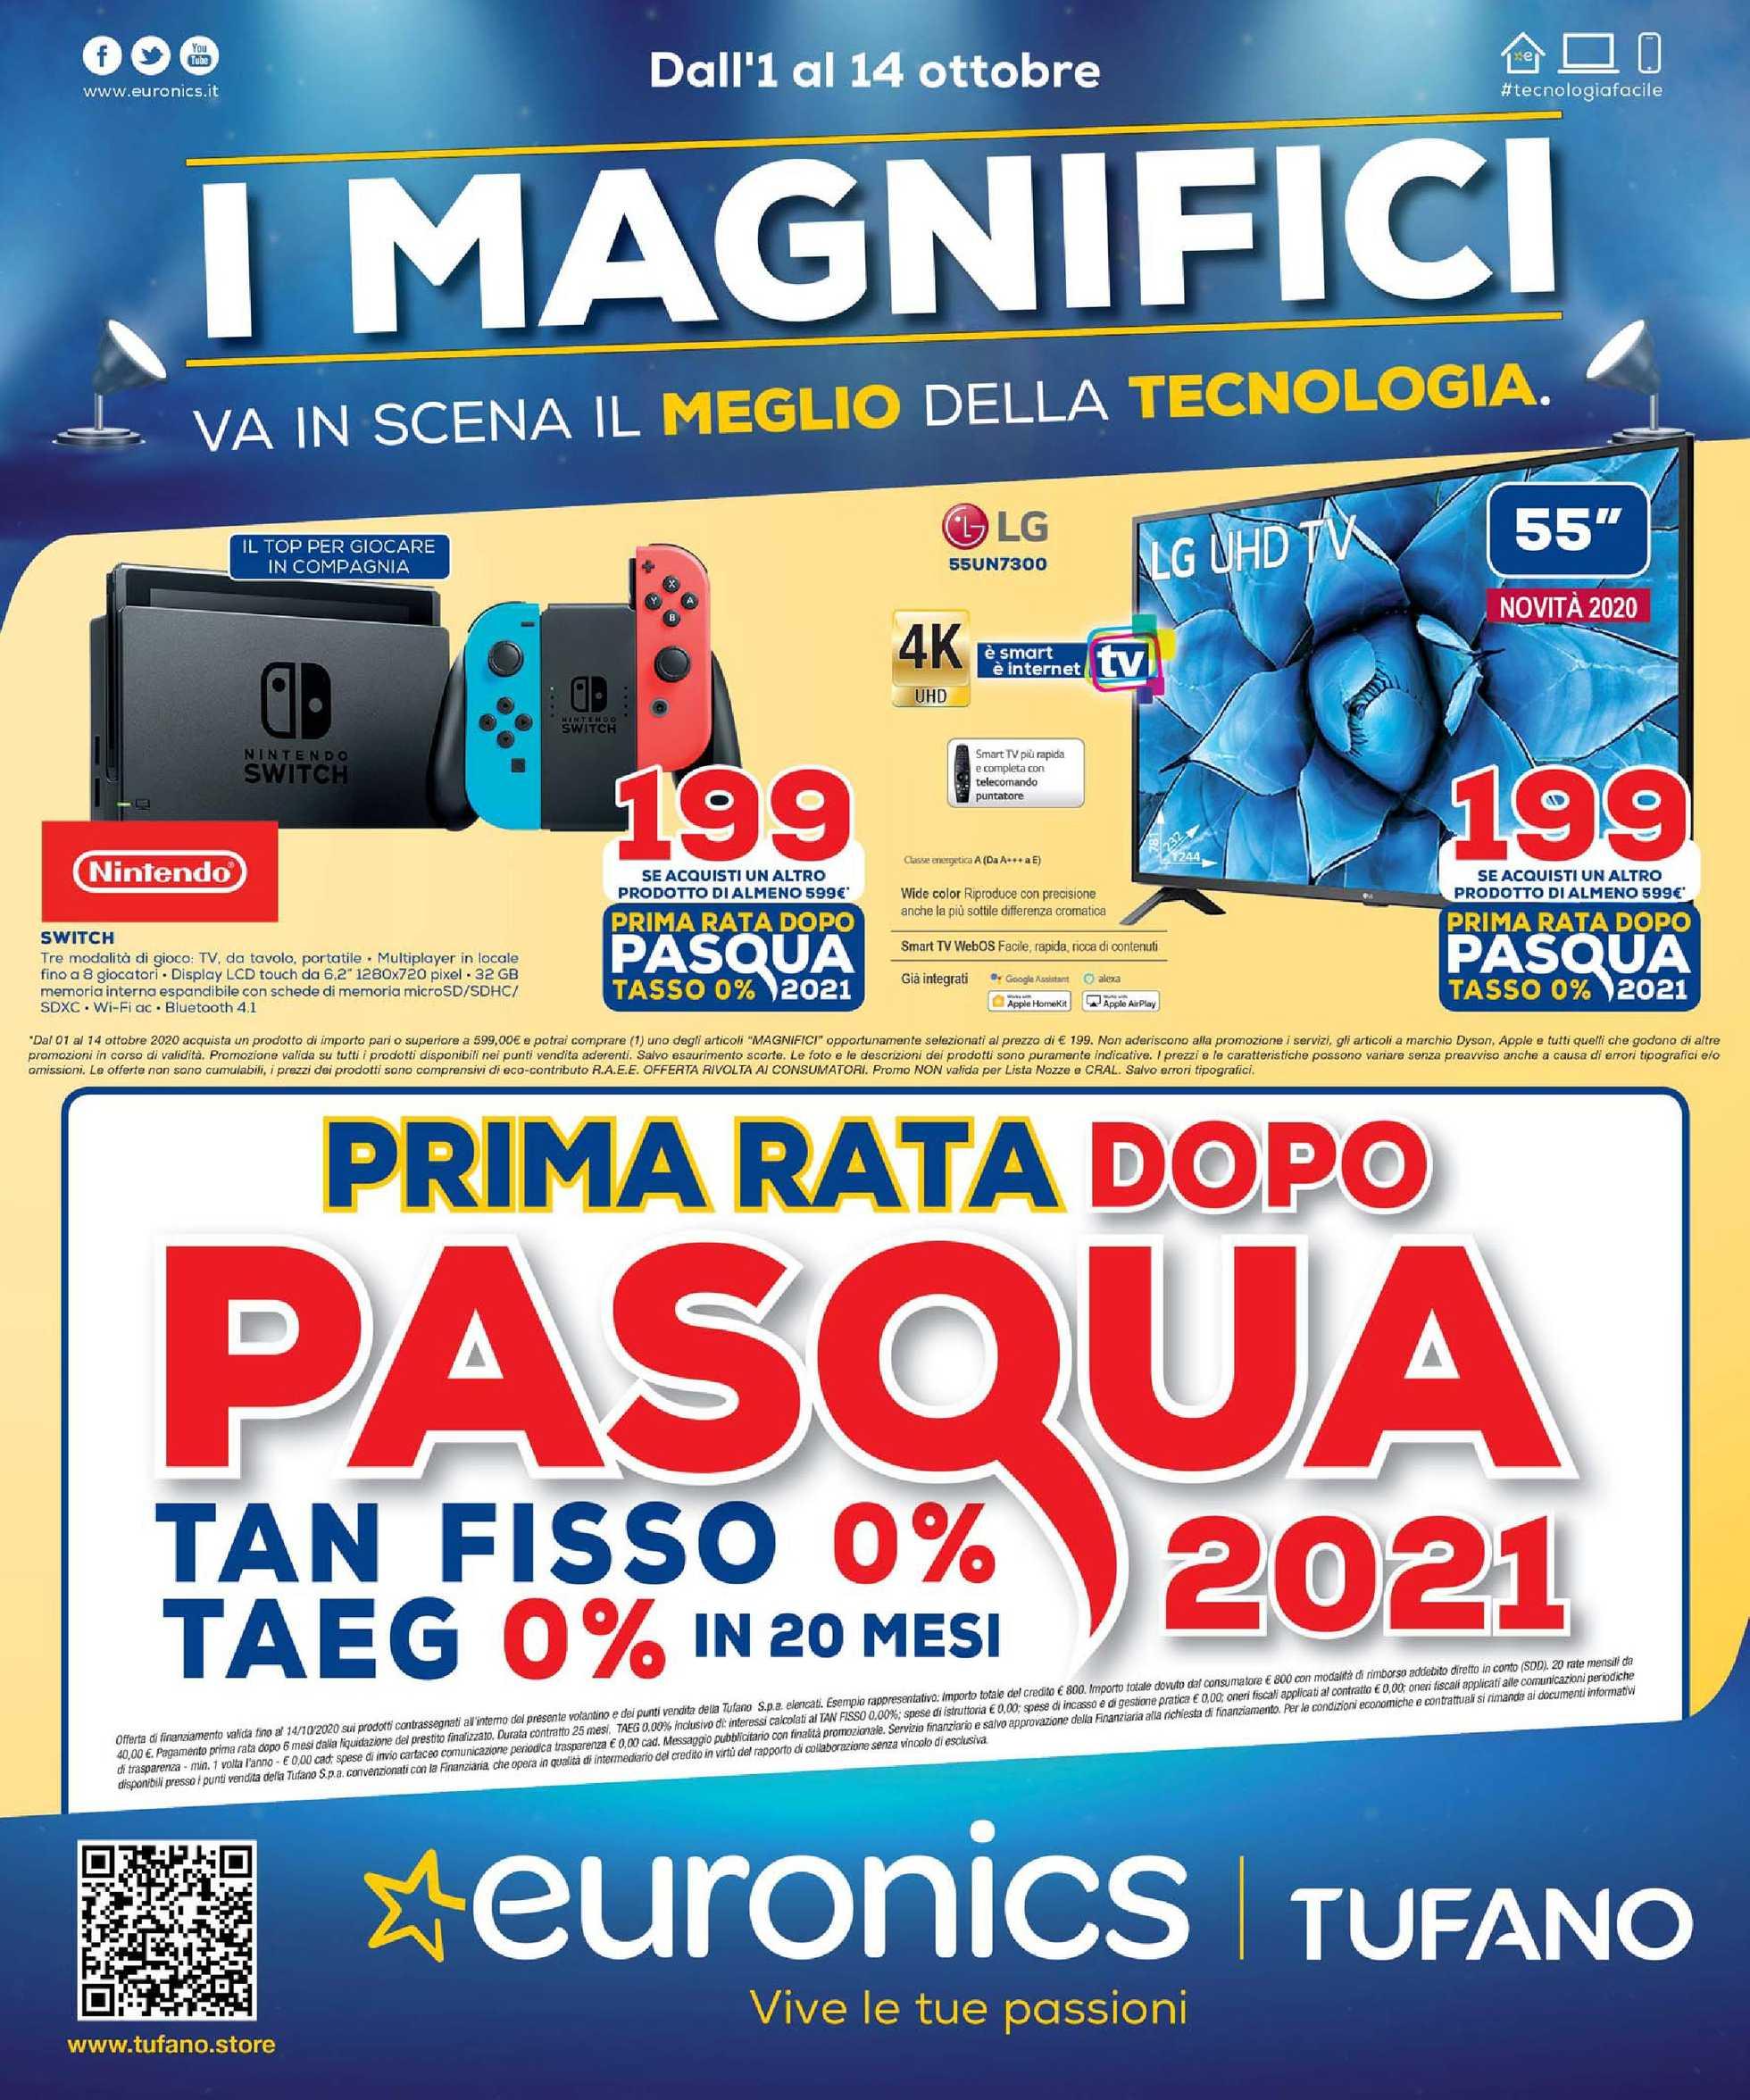 Euronics Bruno - offerte valide dal 01.10.2020 al 14.10.2020 - pagina 2.